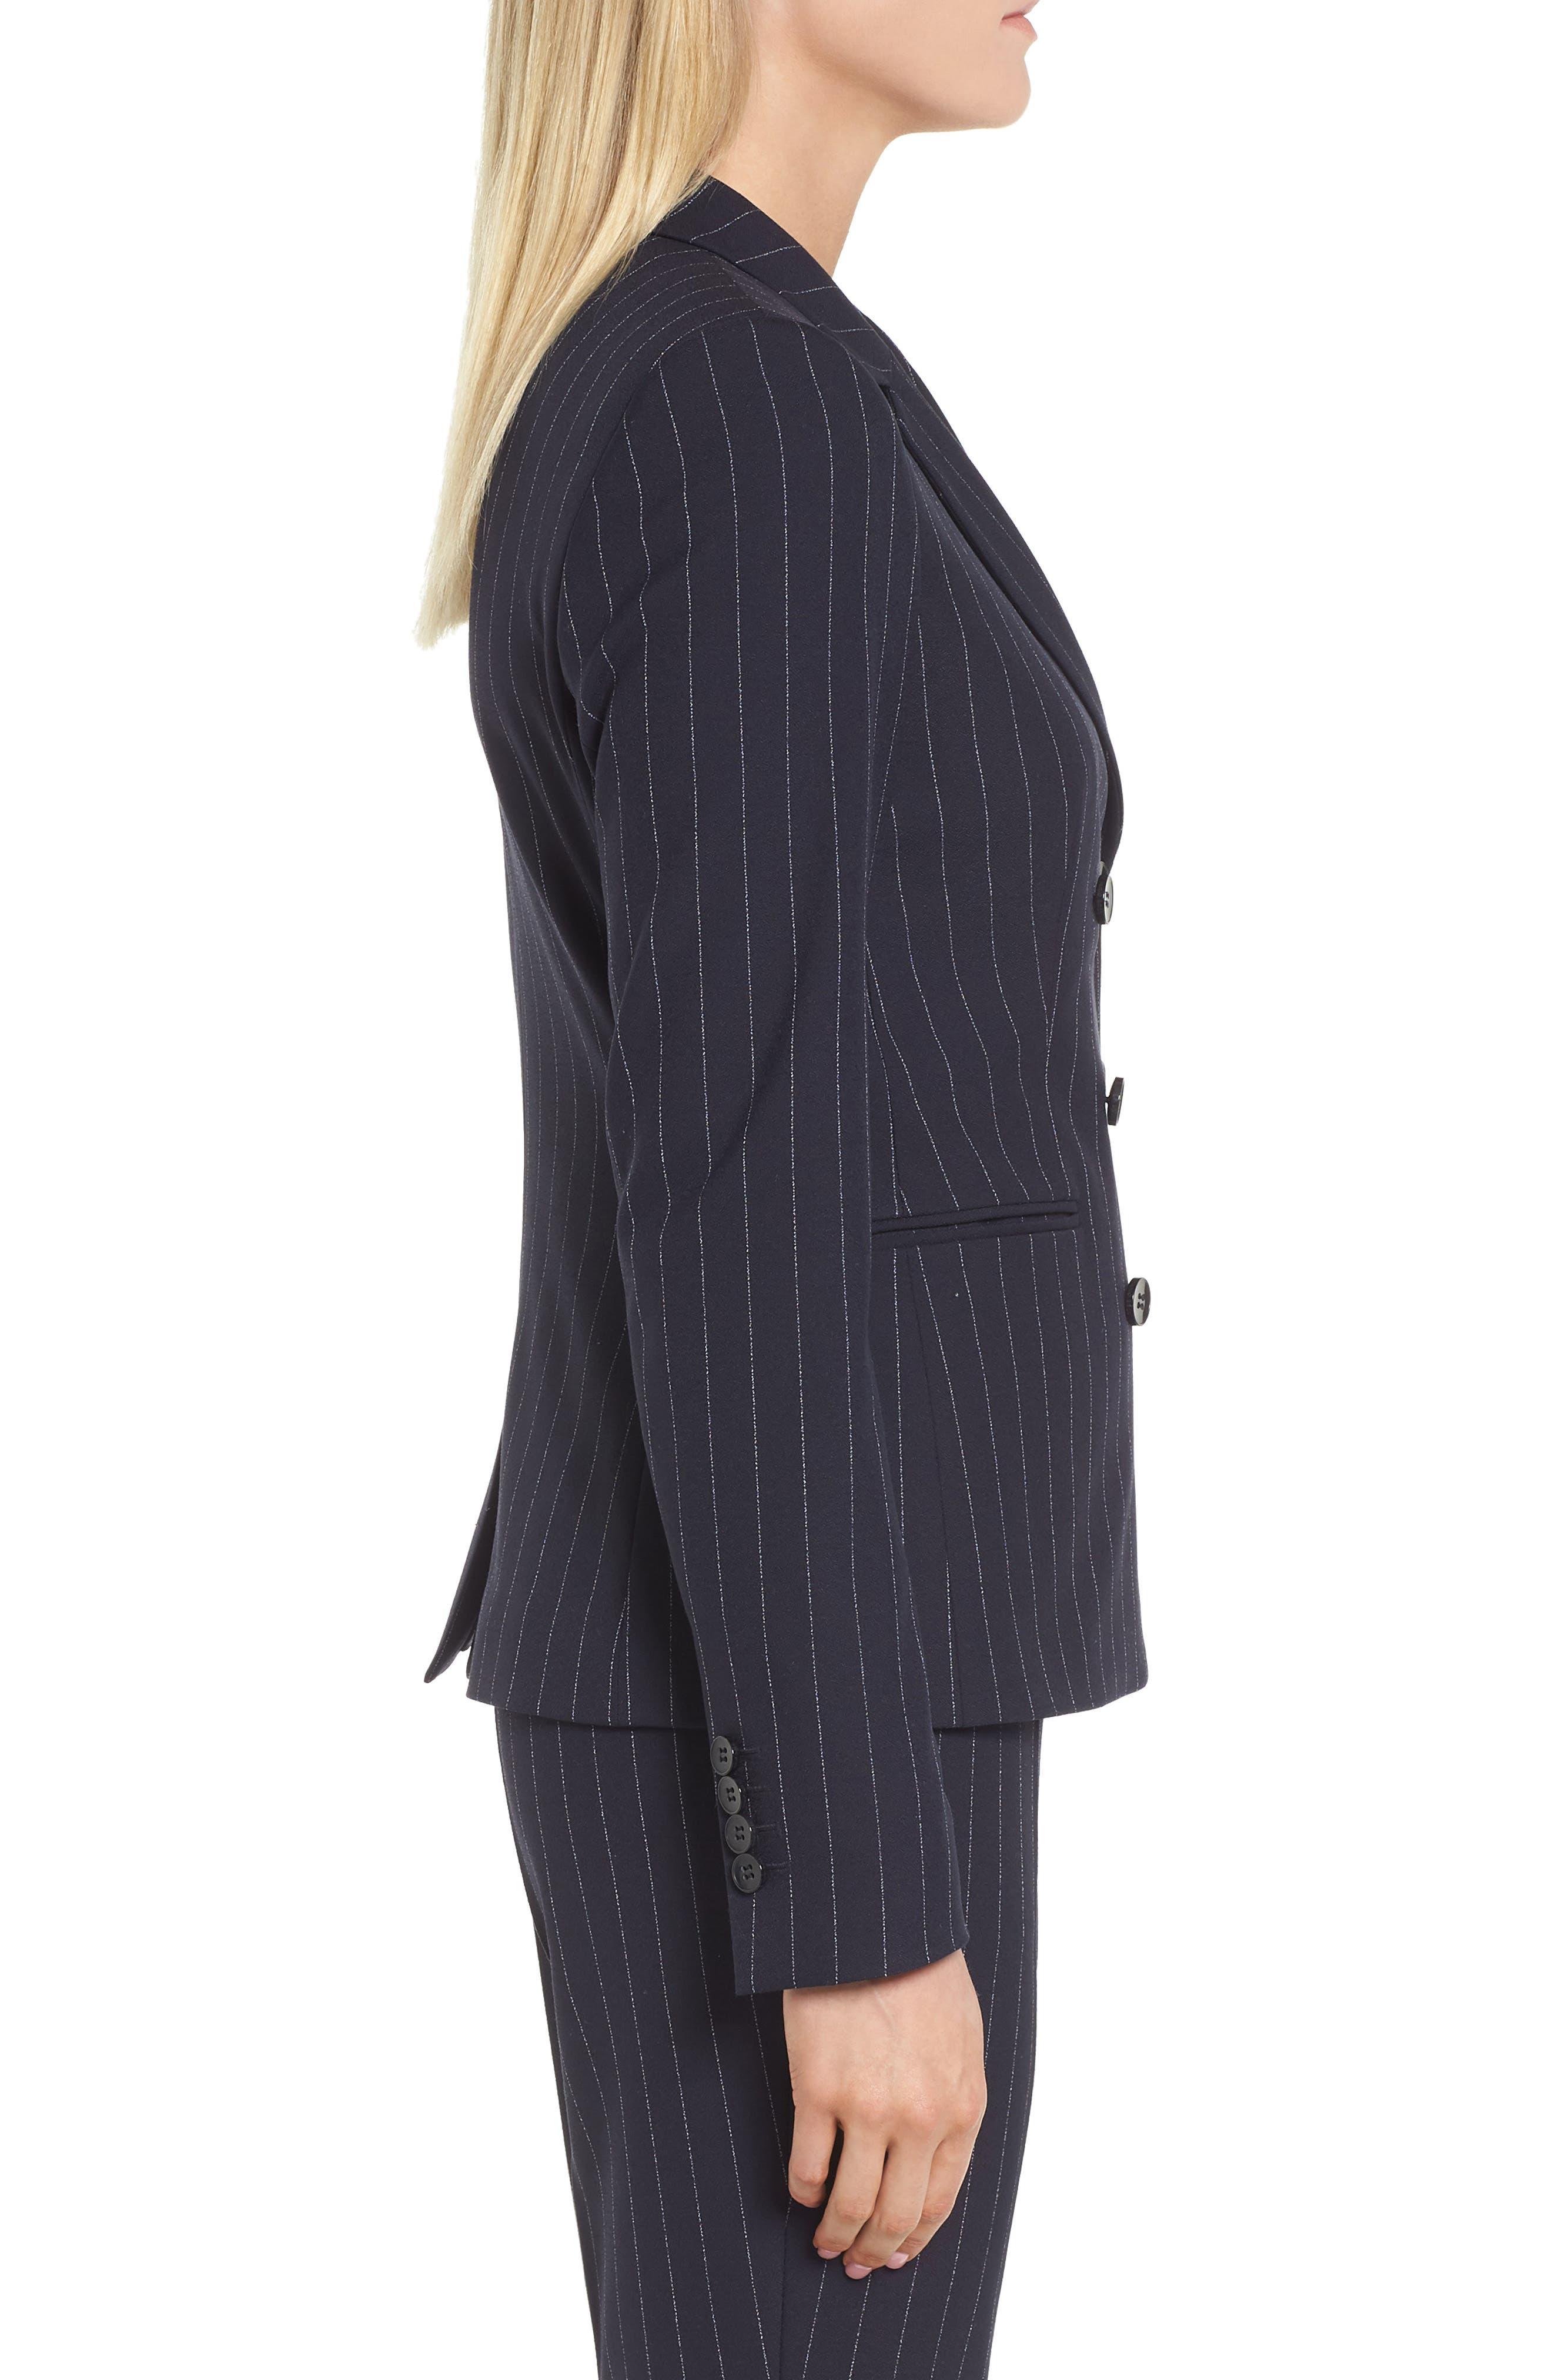 Jelaya Double Breasted Suit Jacket,                             Alternate thumbnail 3, color,                             Navy Fantasy